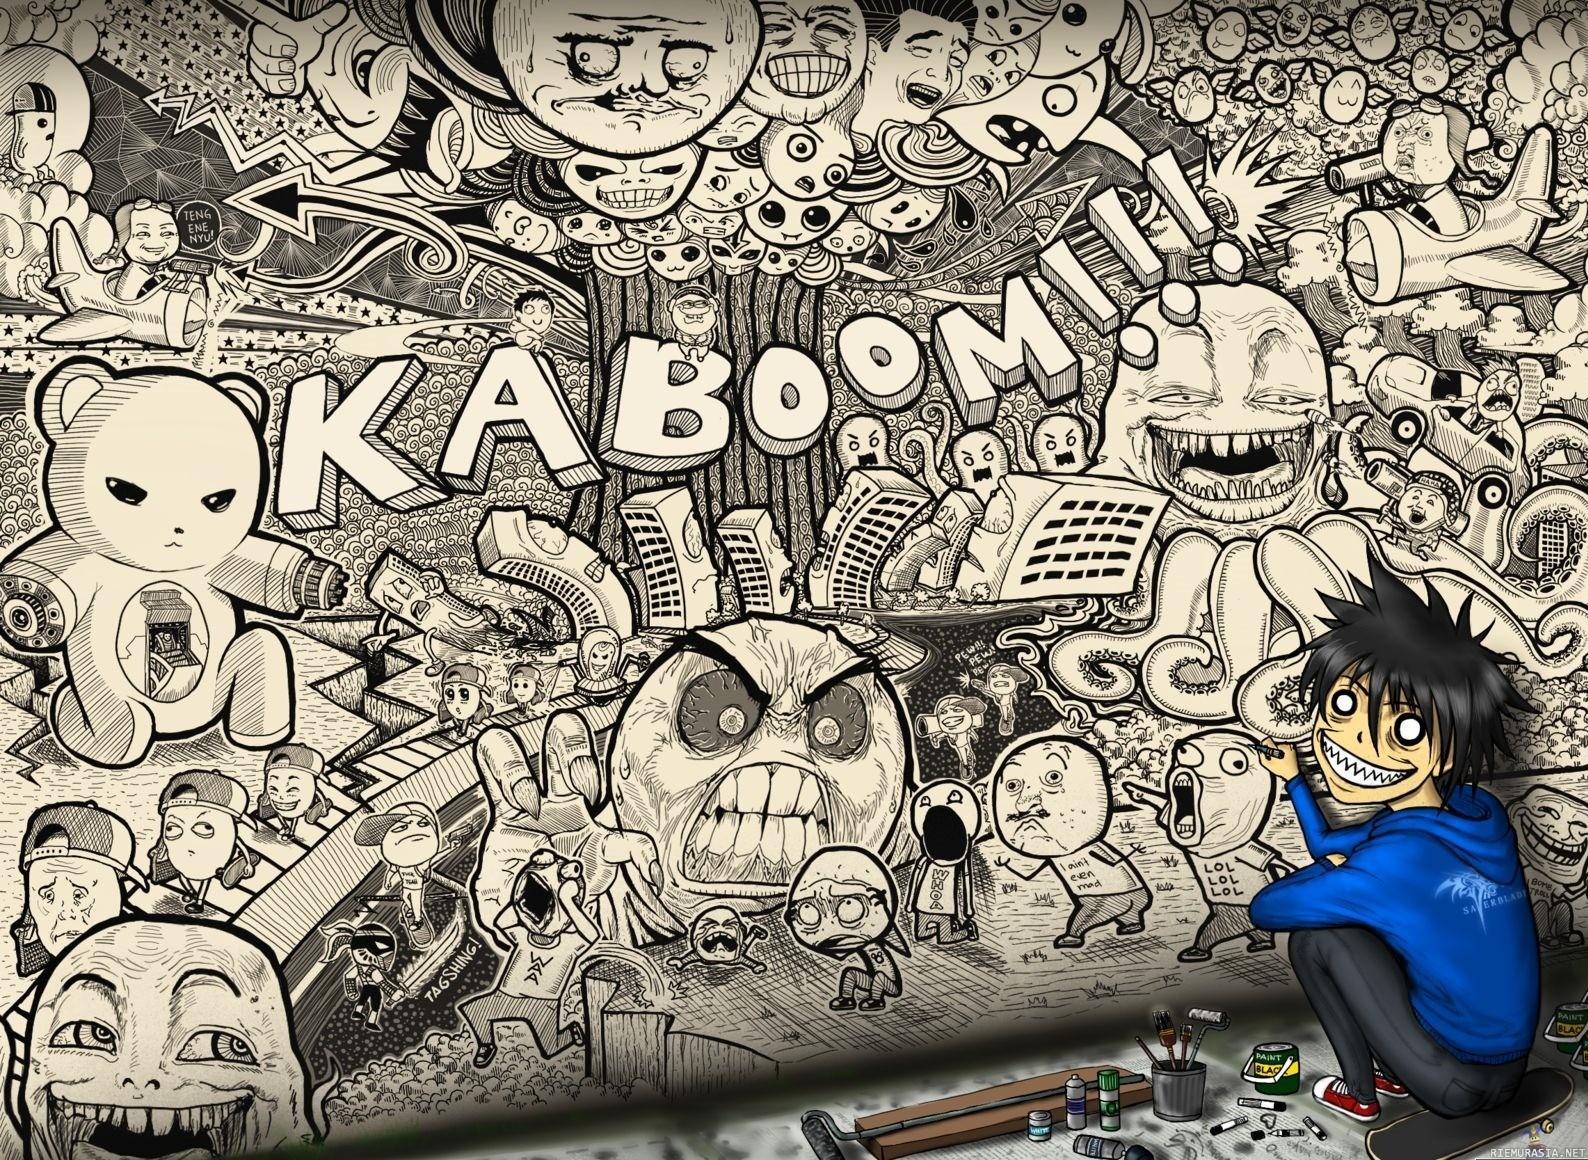 Graffiti Background - WallpaperSafari